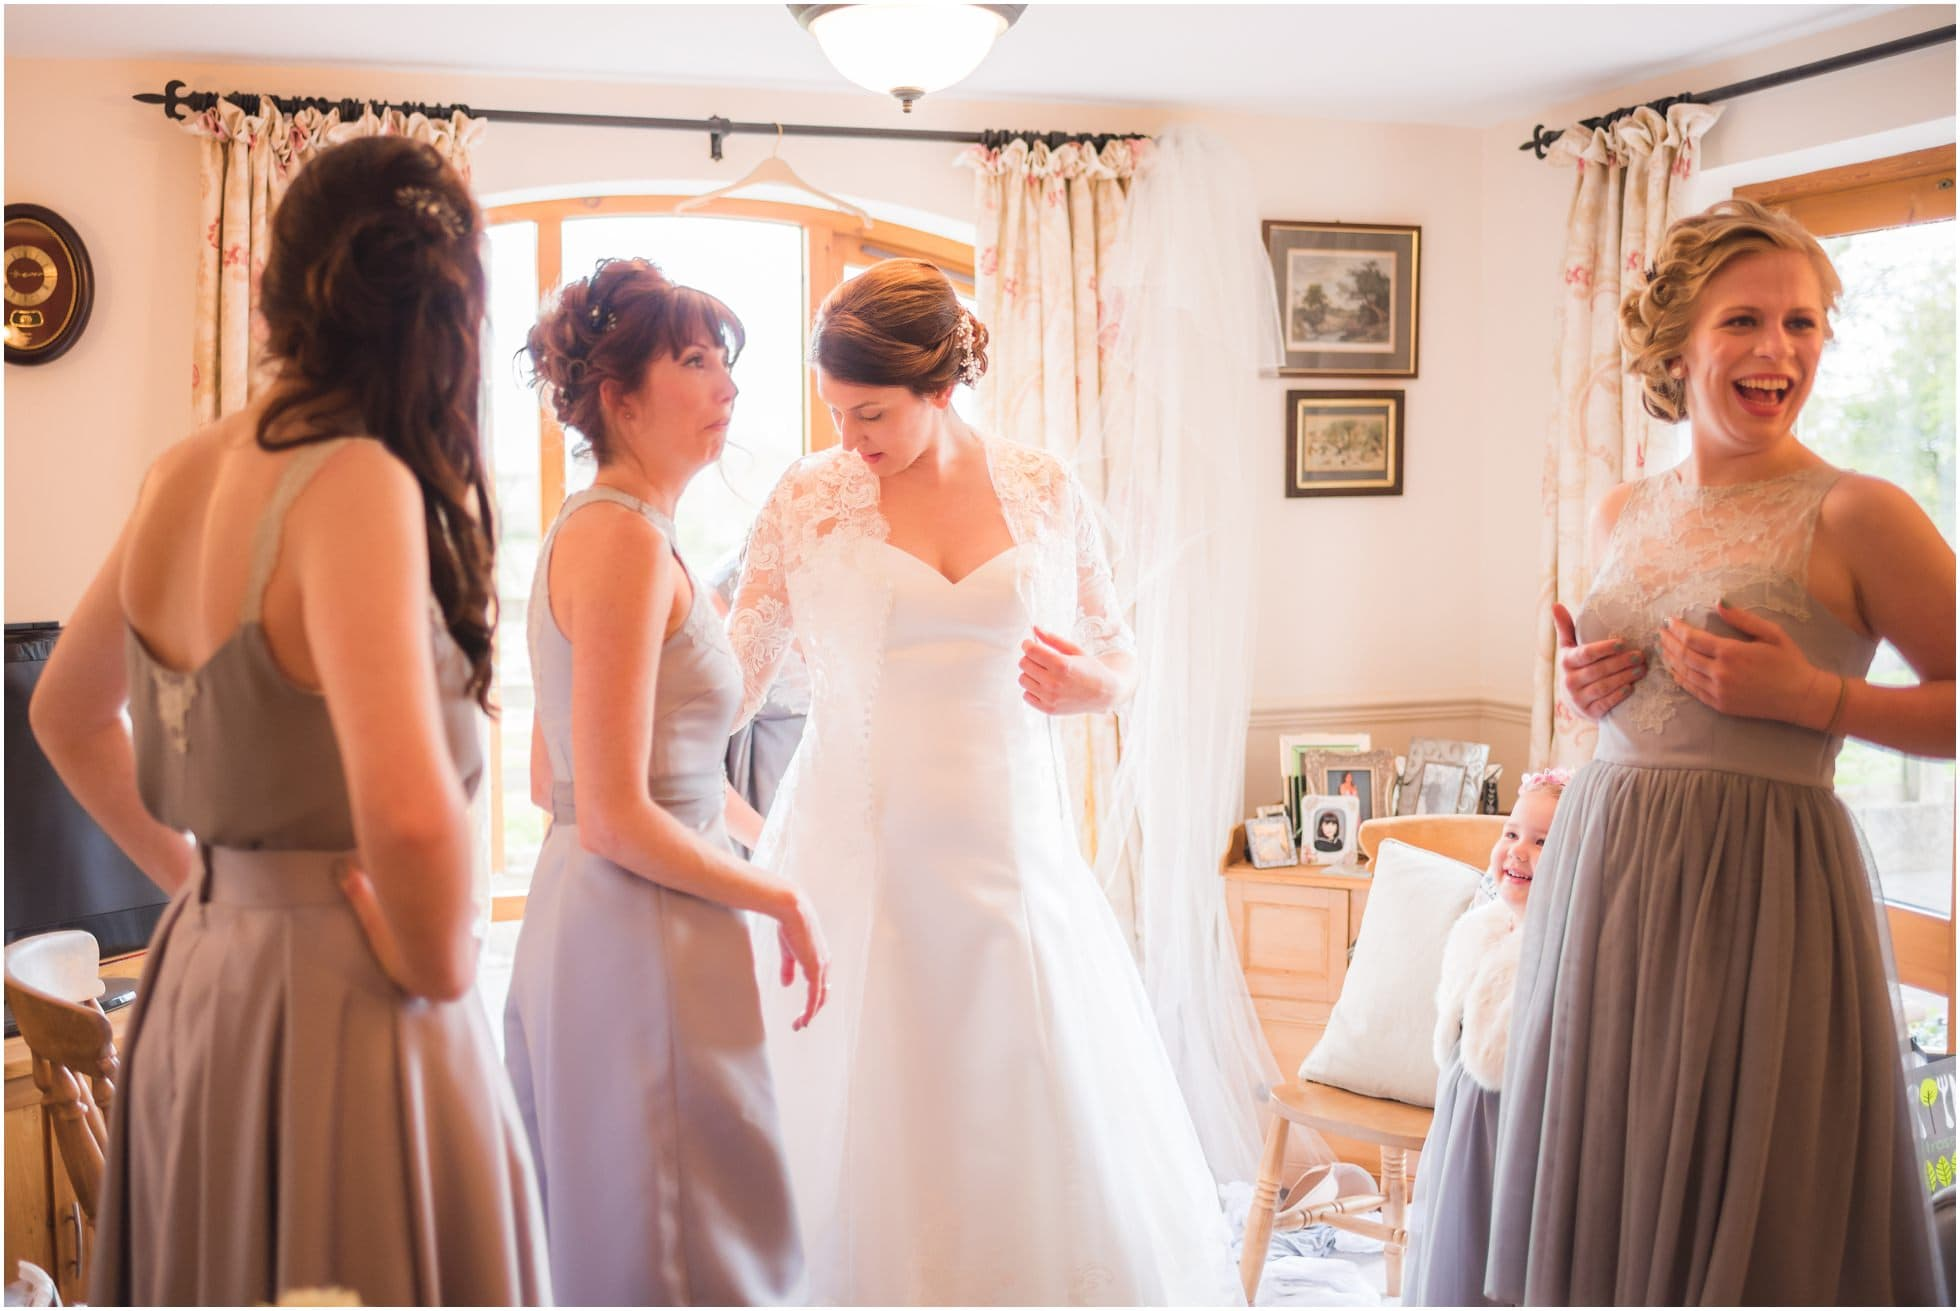 Bridesmaid checks her dress (!)